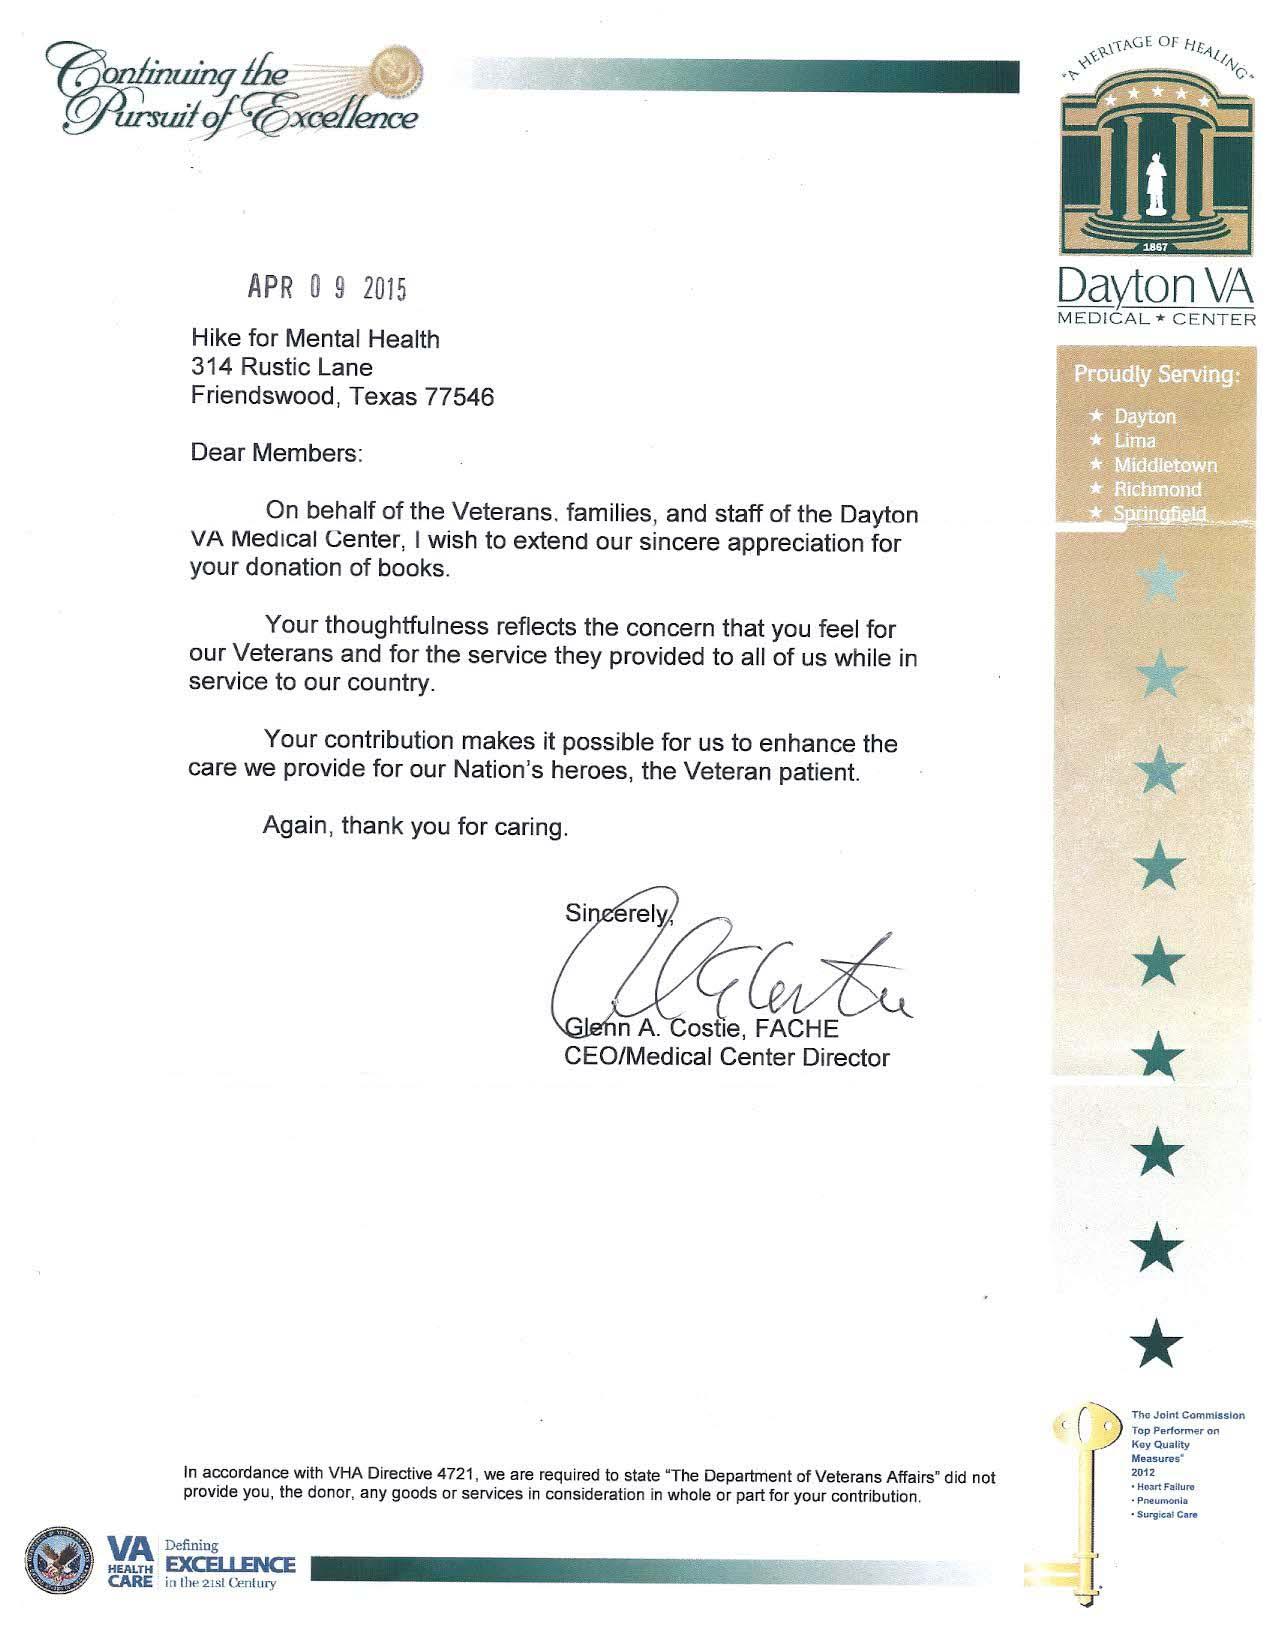 Dayton VA Medical Center Thank You Letter April 2015